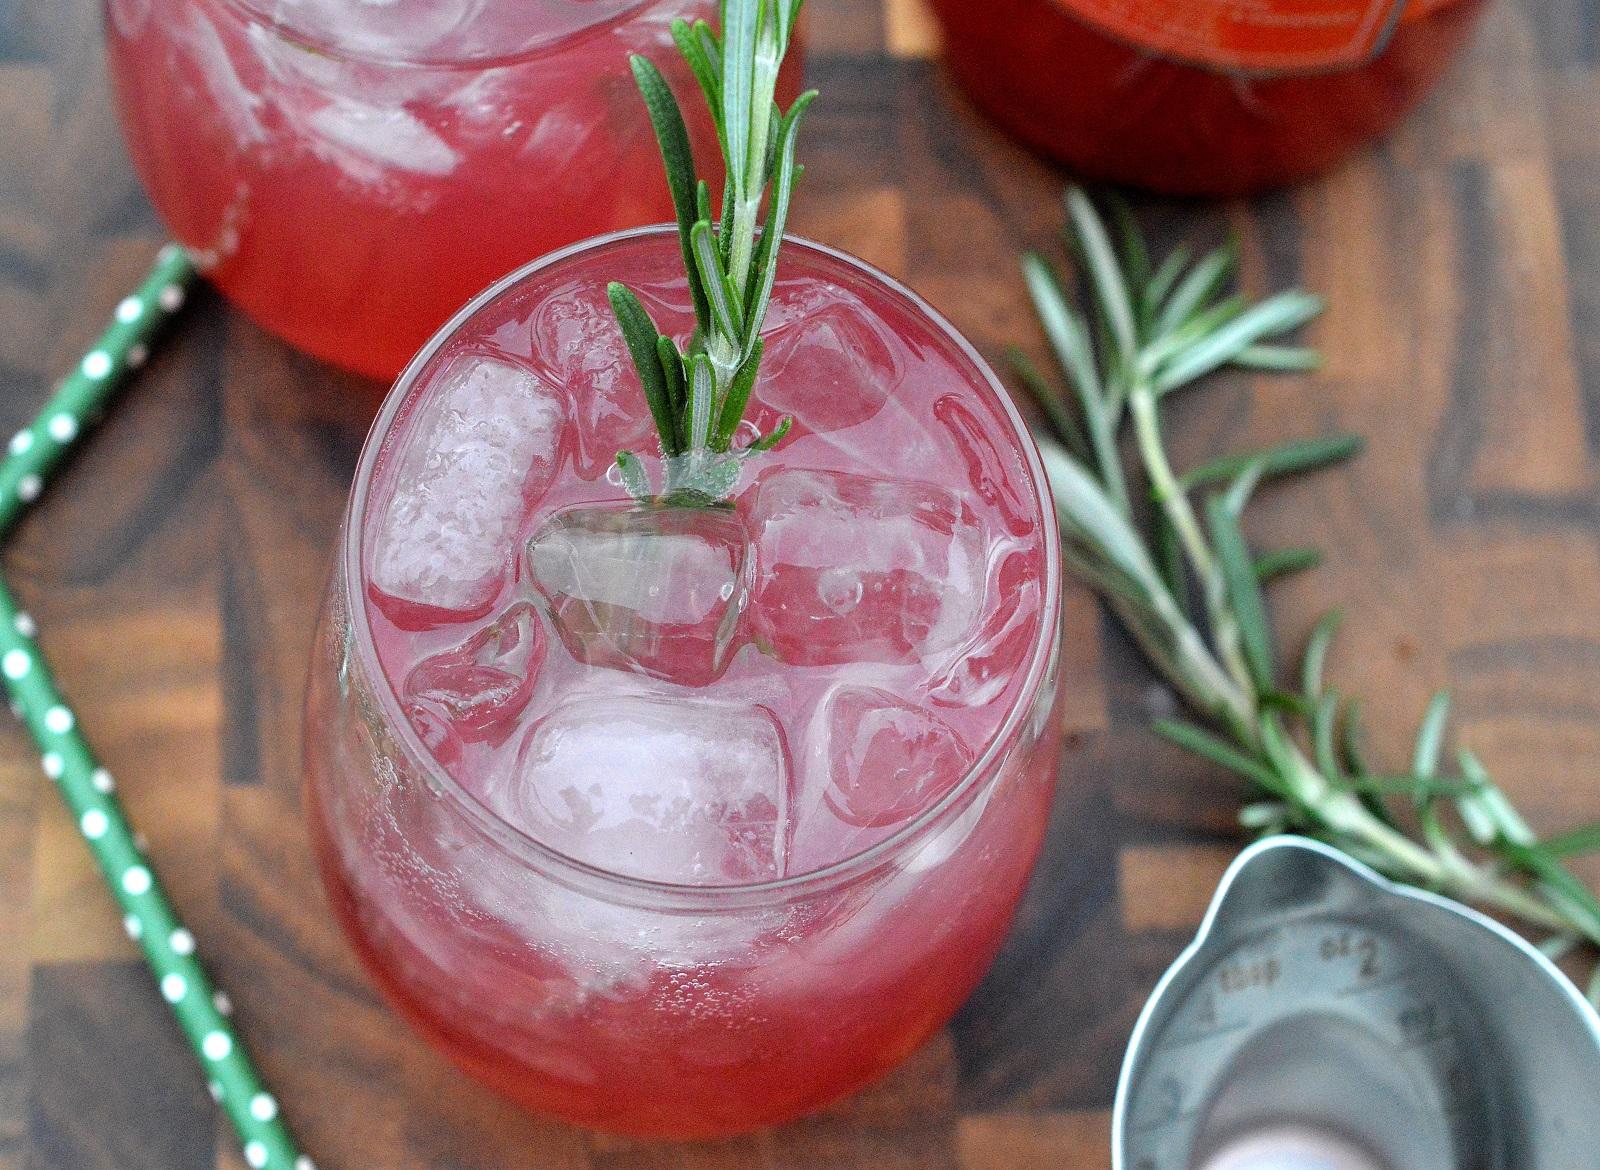 Delicious Blood Orange Rosemary Vodka Cooler